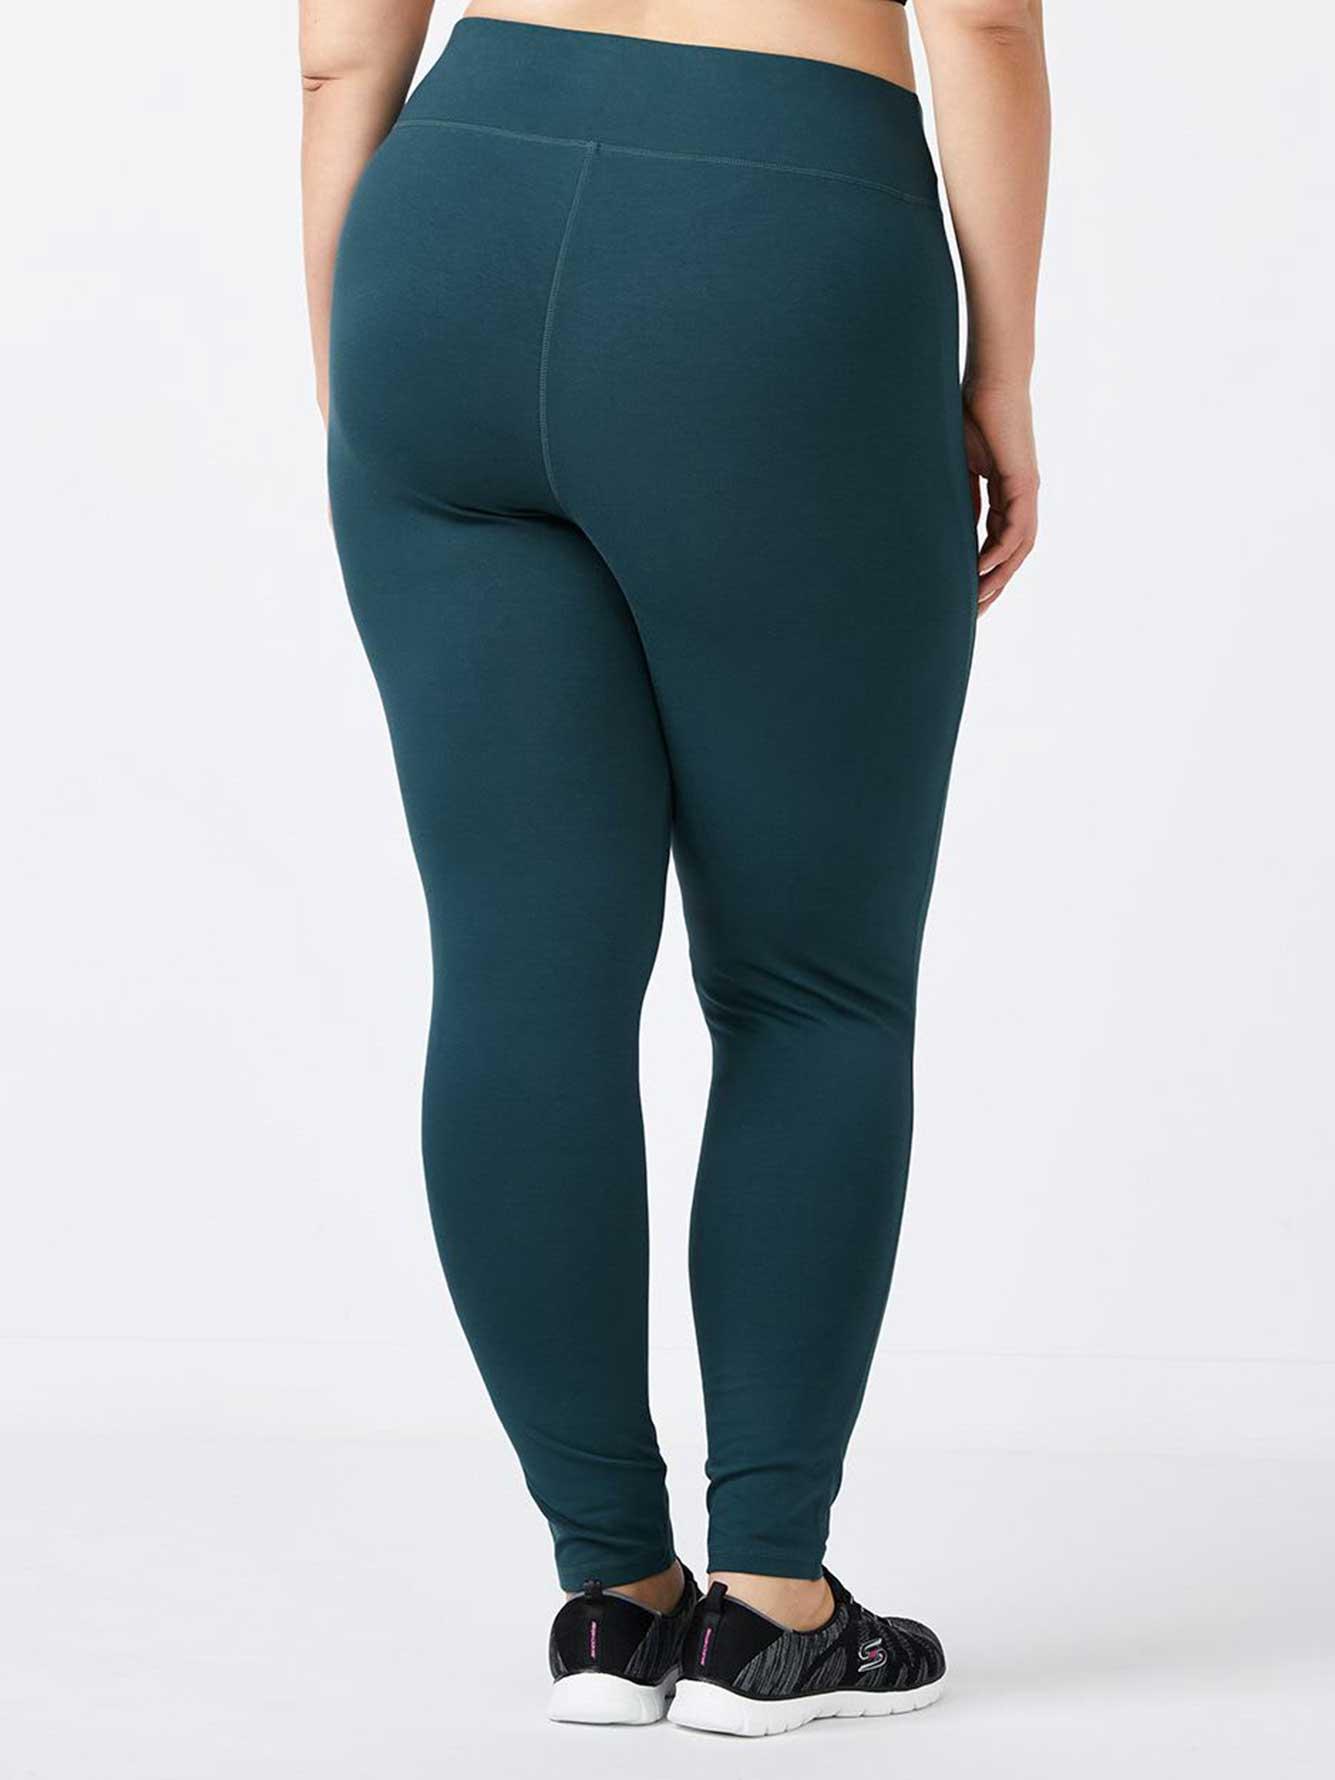 ONLINE ONLY - Plus-Size Basic Legging - Essentials